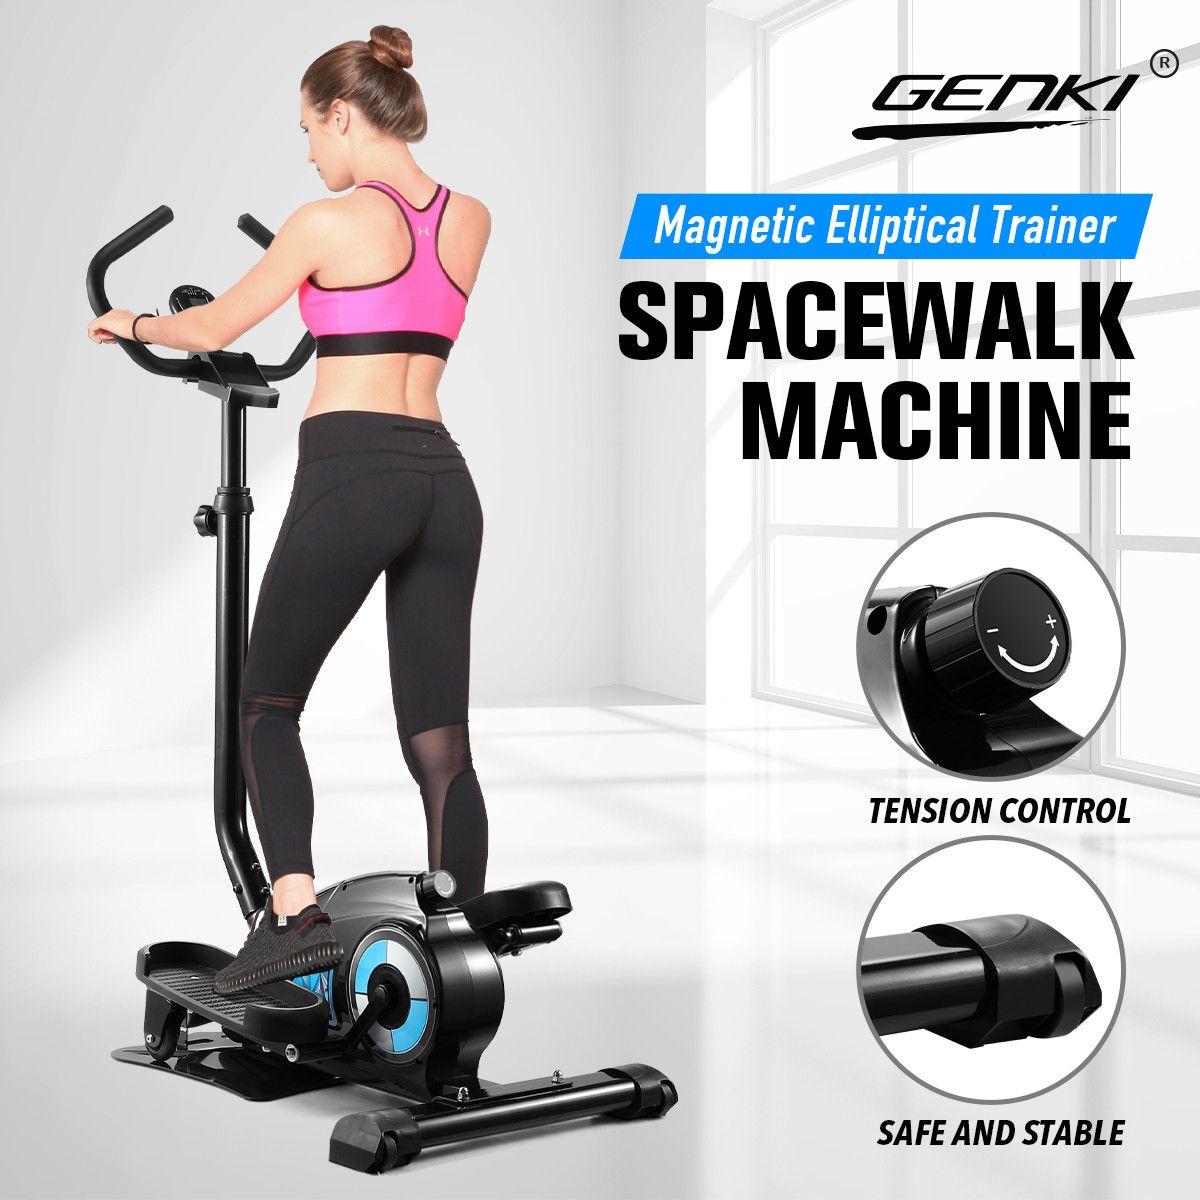 Genki YB-E2 Pro Cross Trainer Home Gym Equipment     #homegym #gym #workout